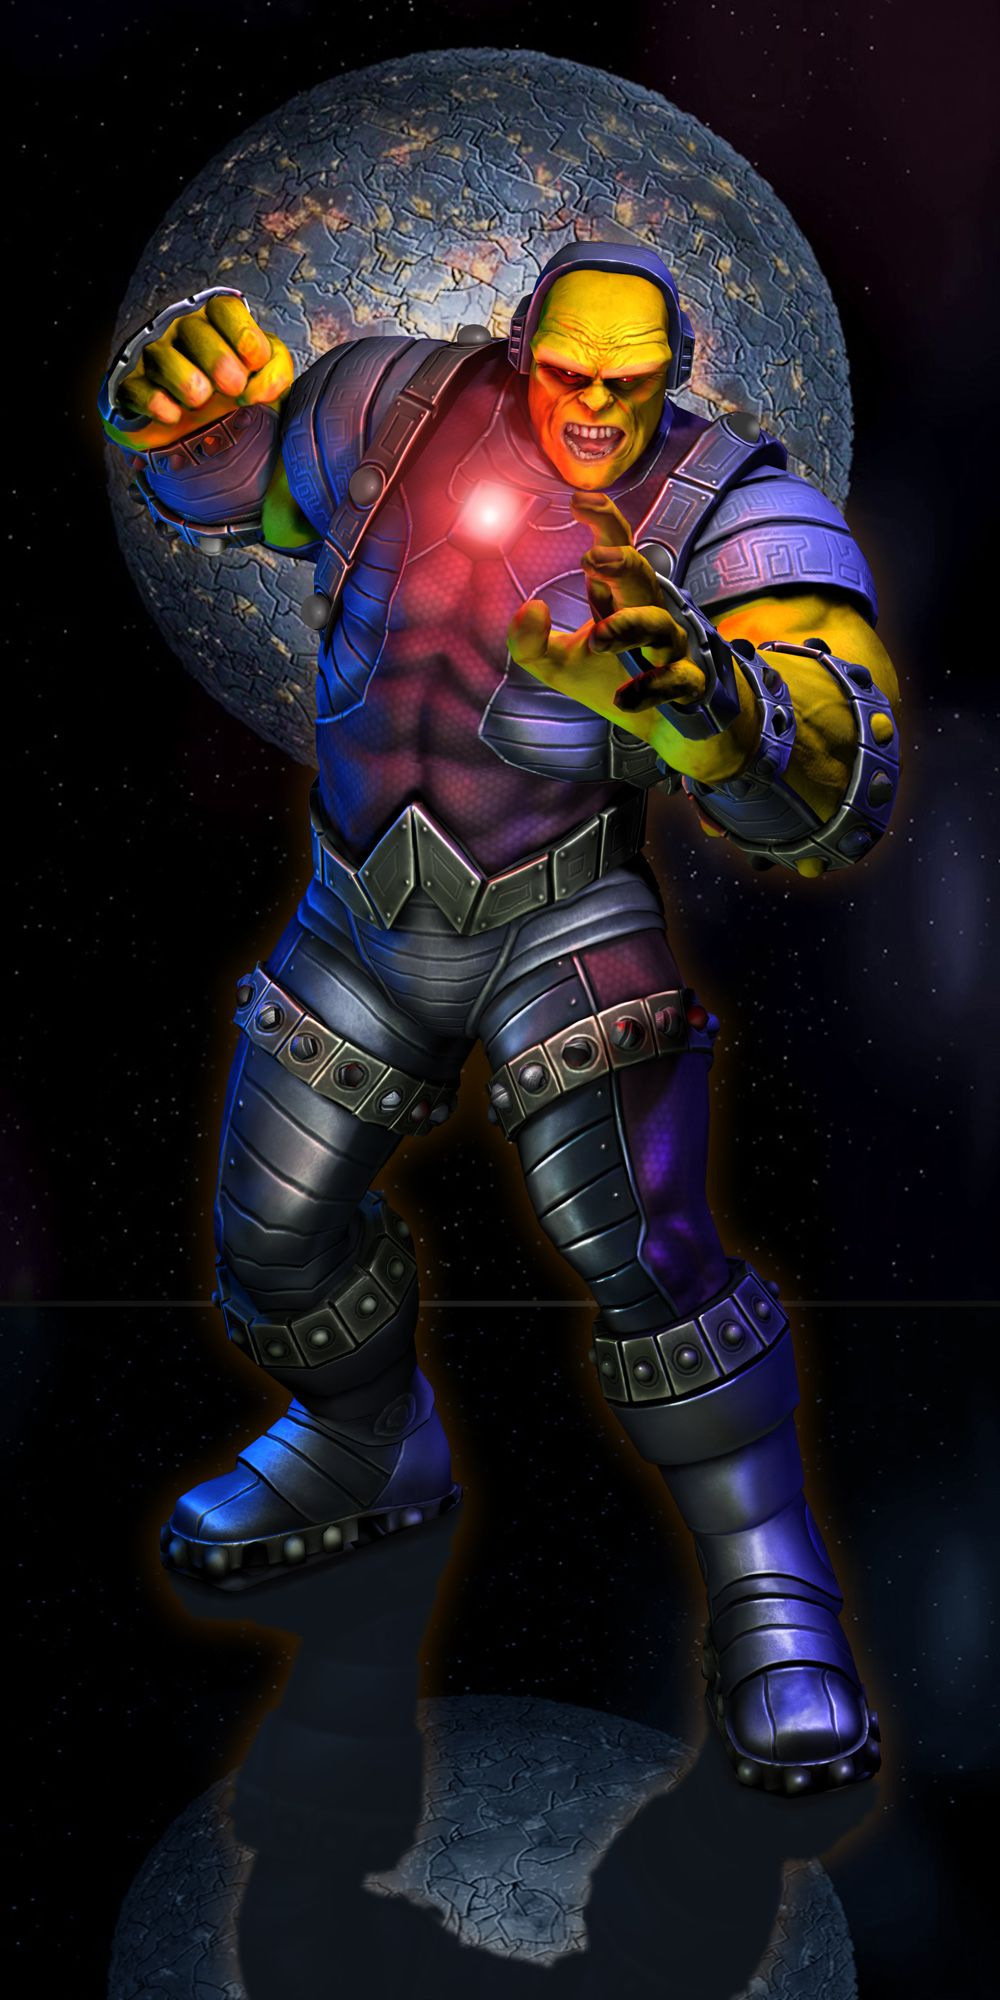 Justice League Game Mongul Jon Gwyn Dc Comics Heroes Comic Book Characters Superhero